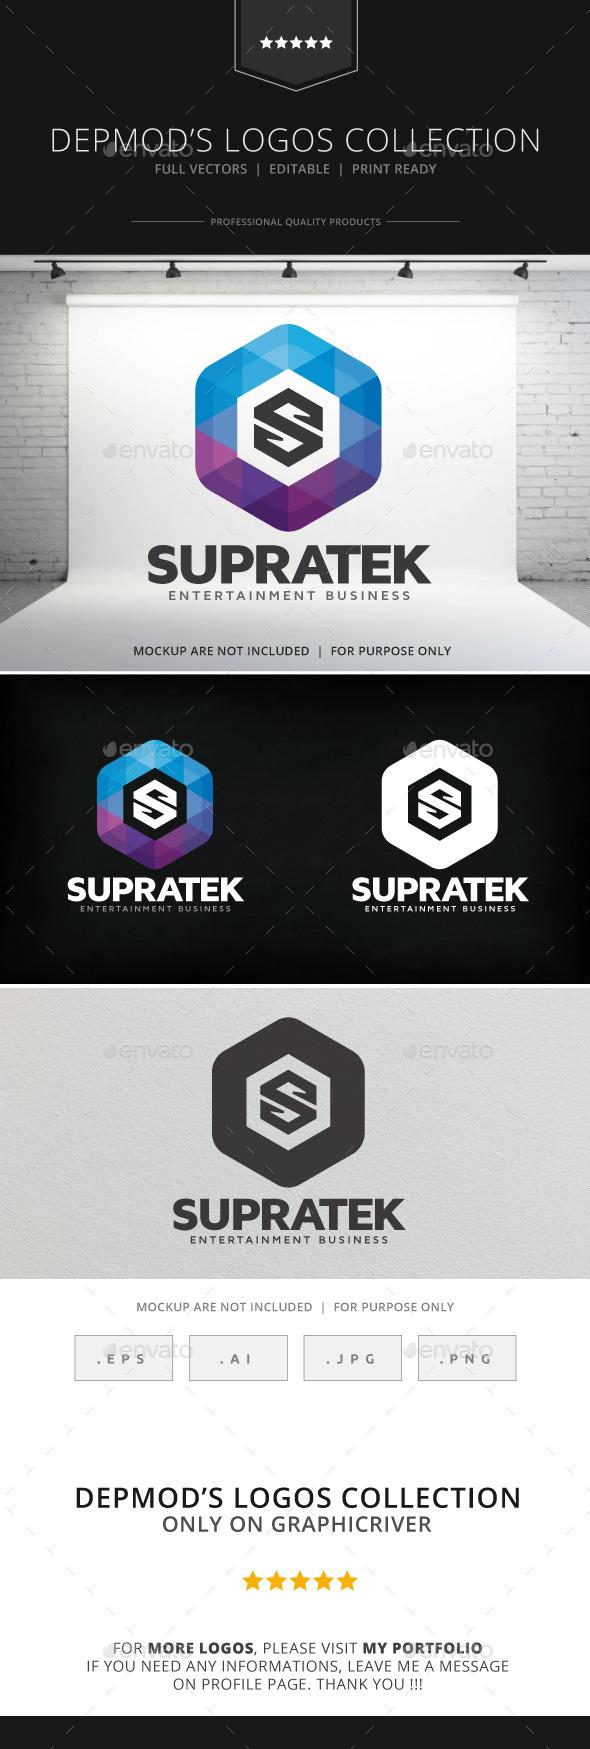 GraphicRiver Supratek Logo 8995211